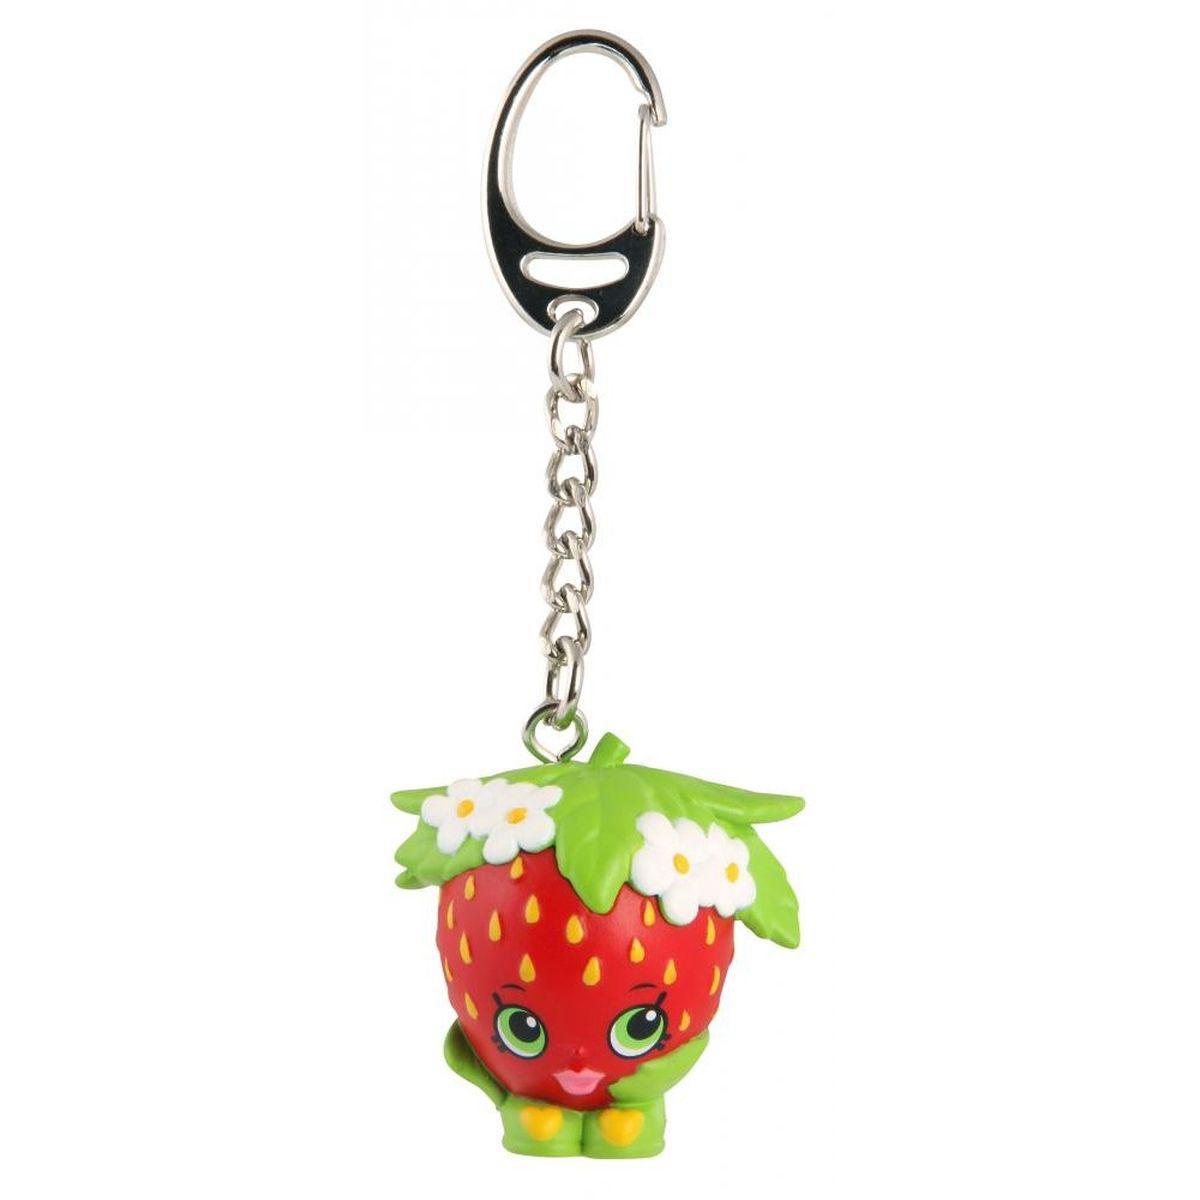 Shopkins Брелок Strawberry Kiss